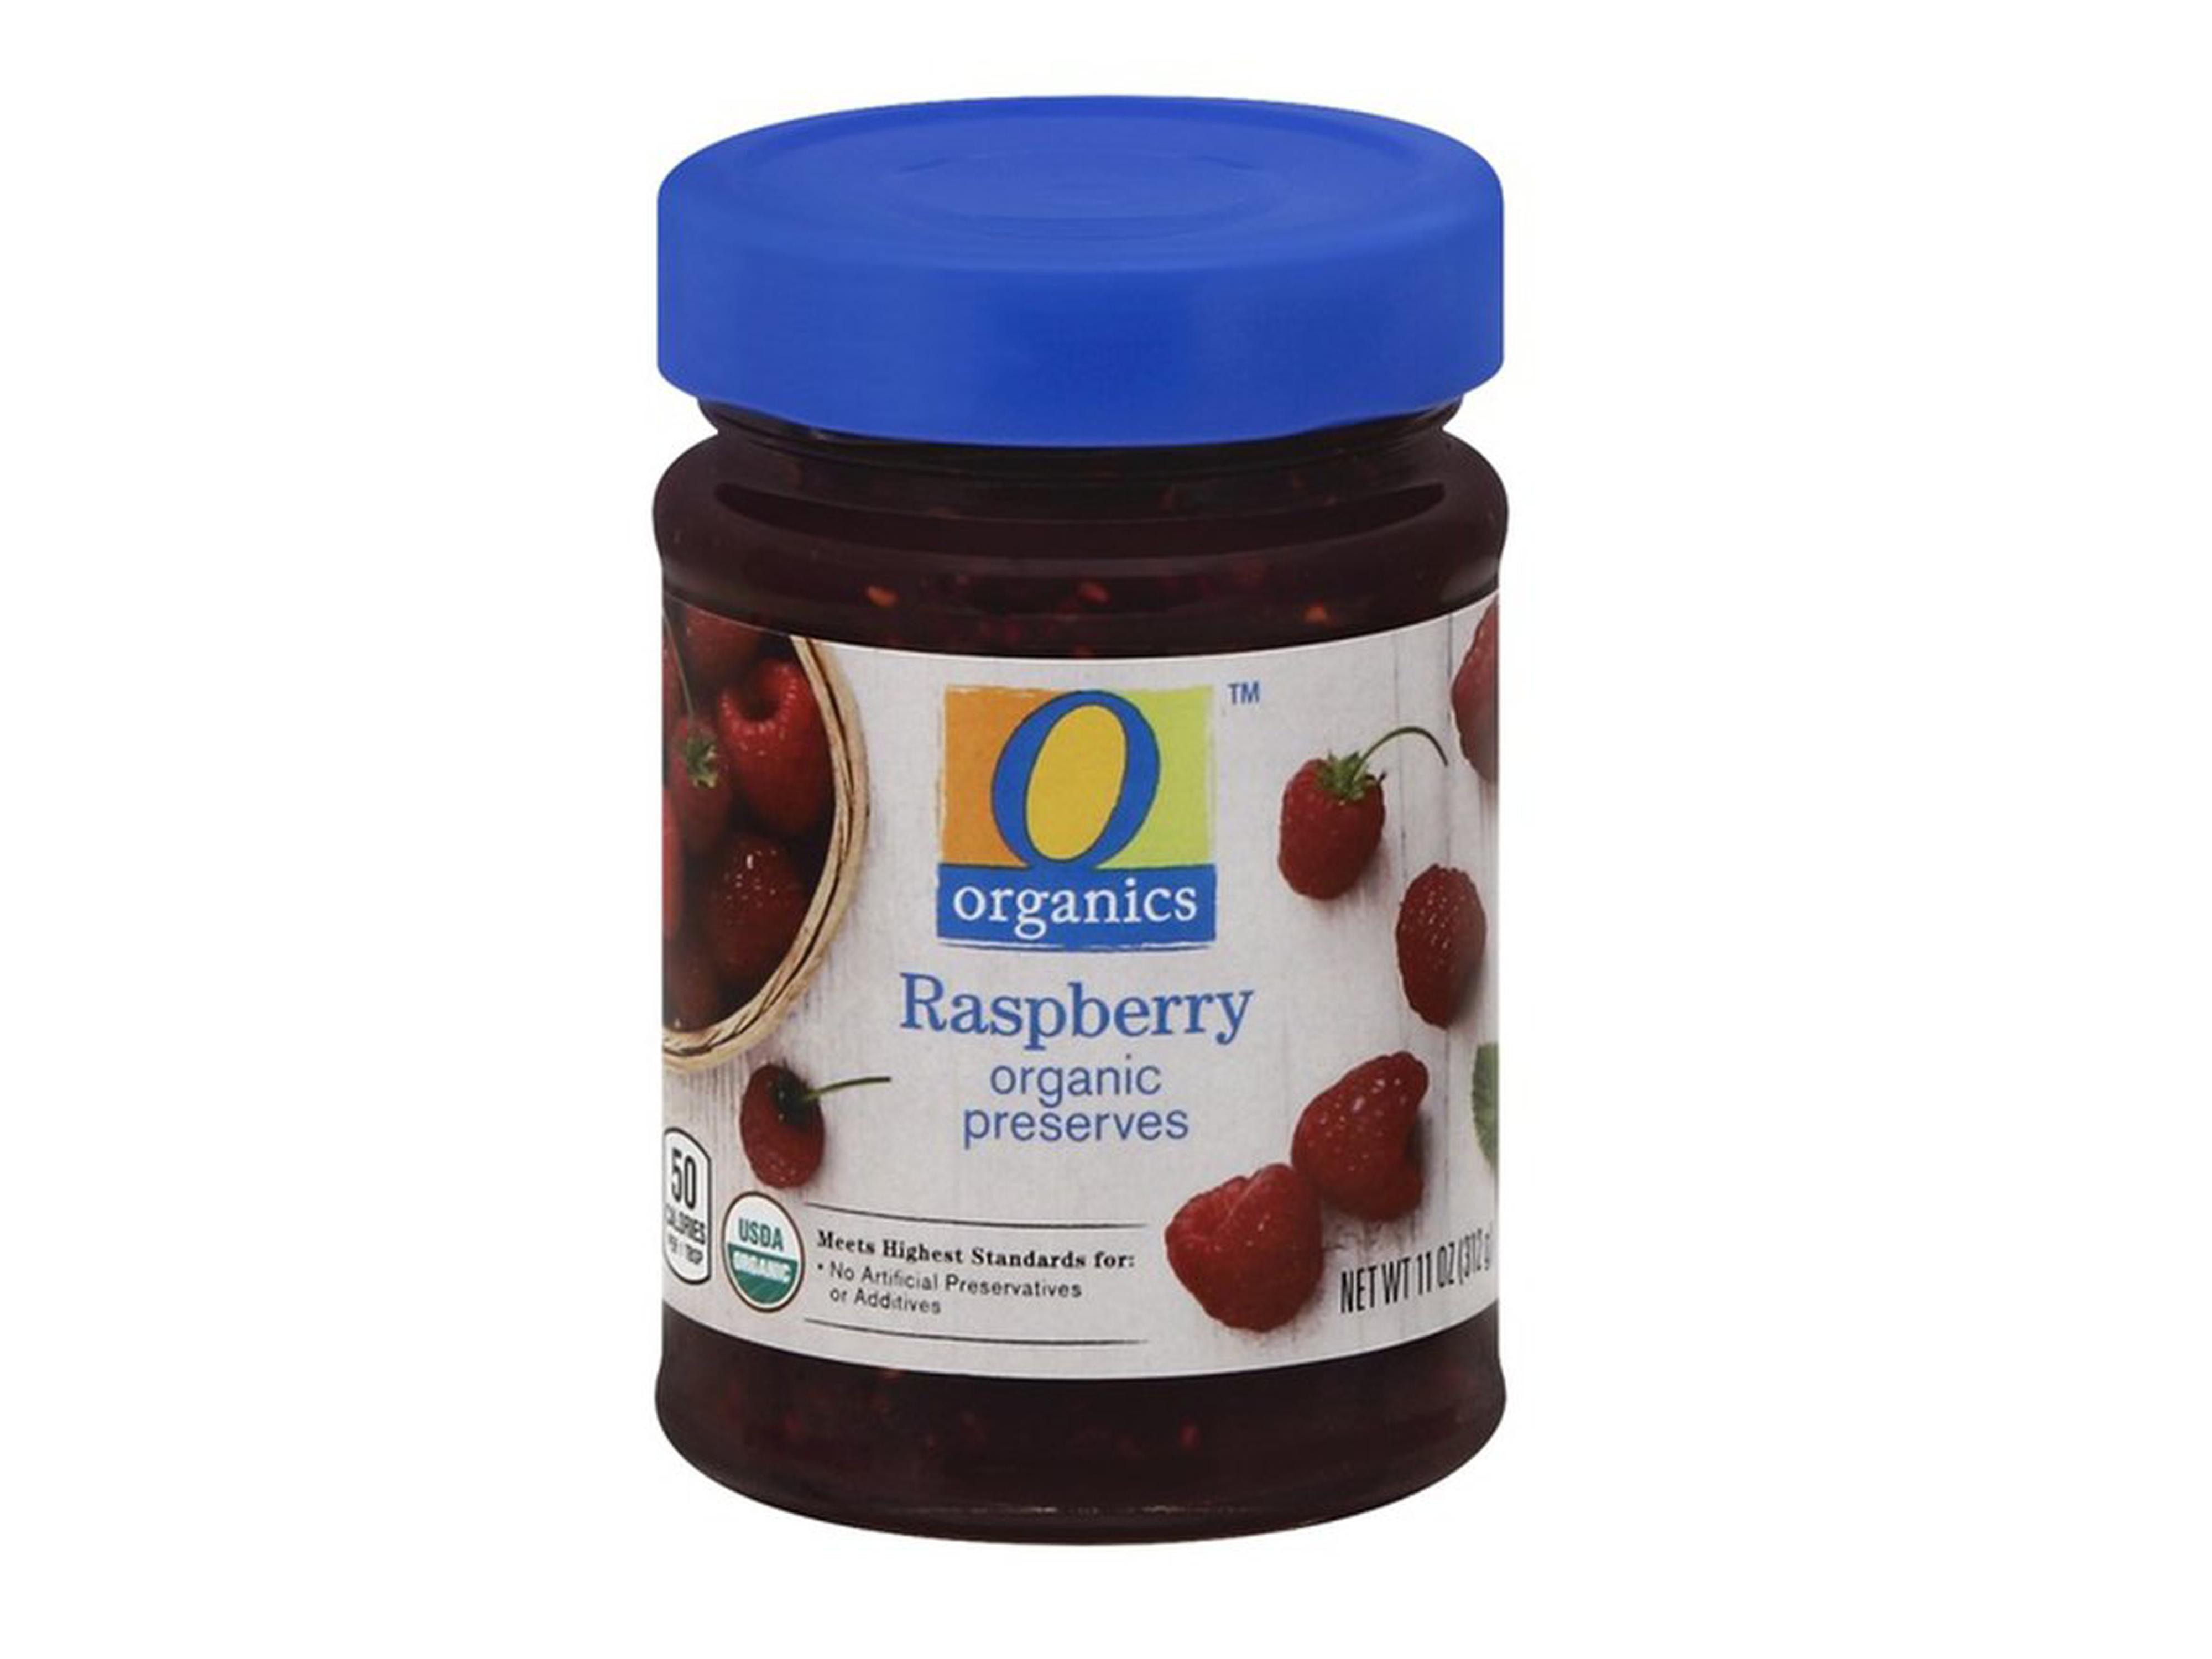 o-organics-raspberry